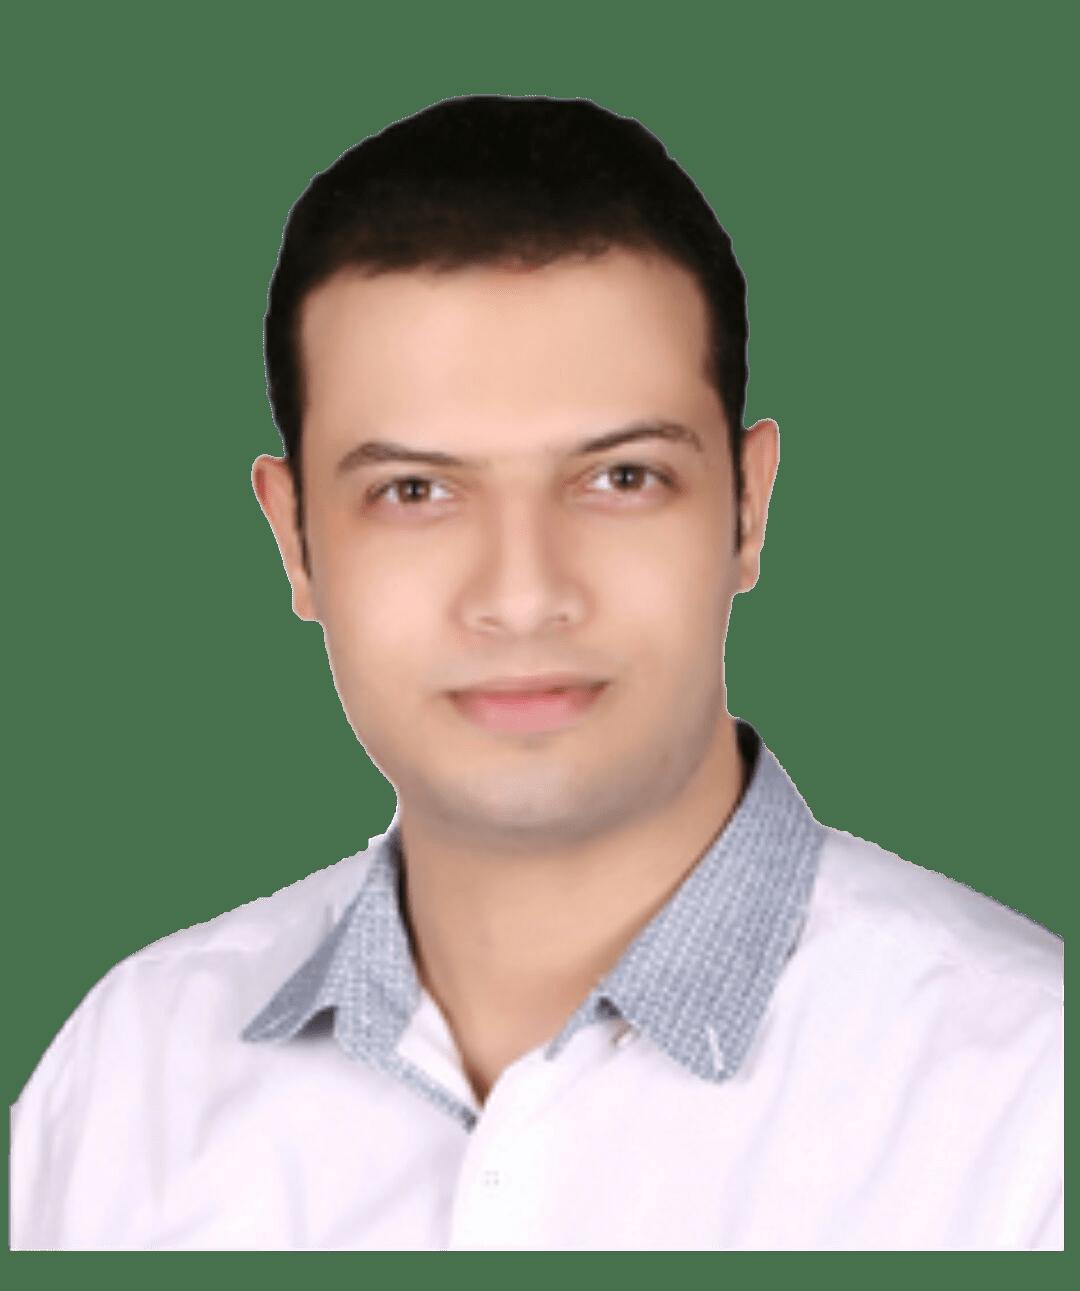 Ibrahim Elsherbini